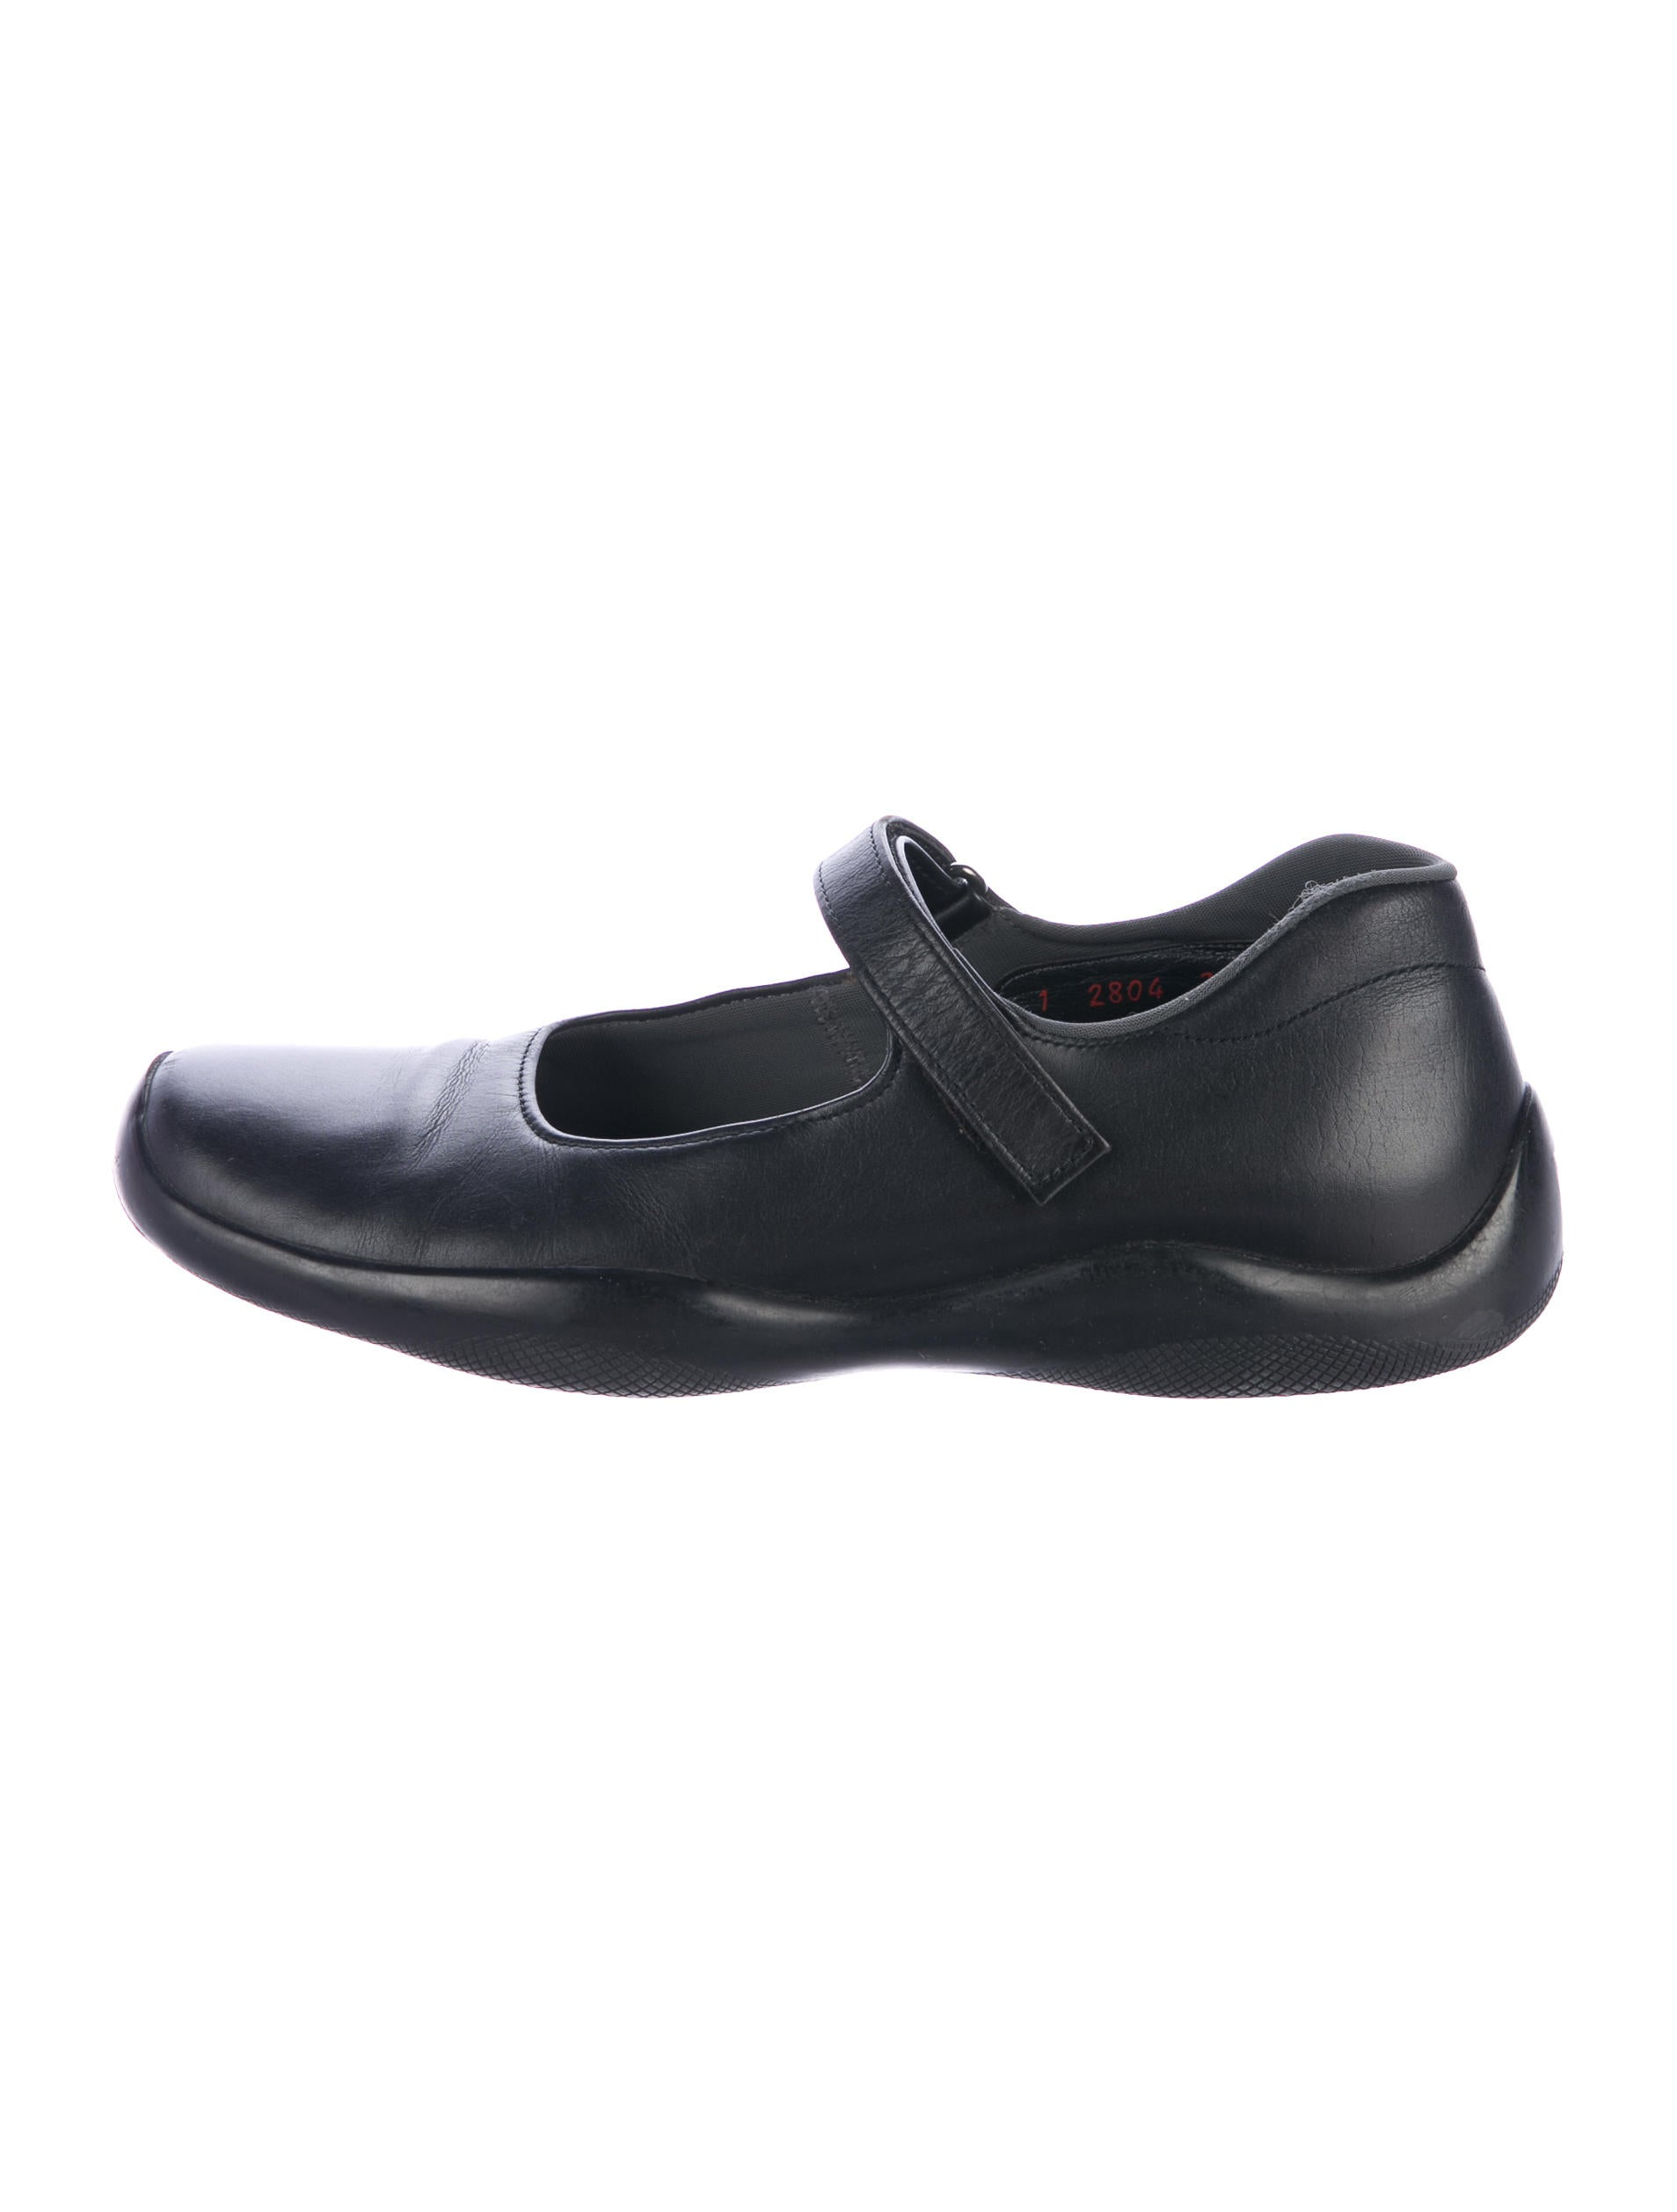 Prada Sport Shoes Price